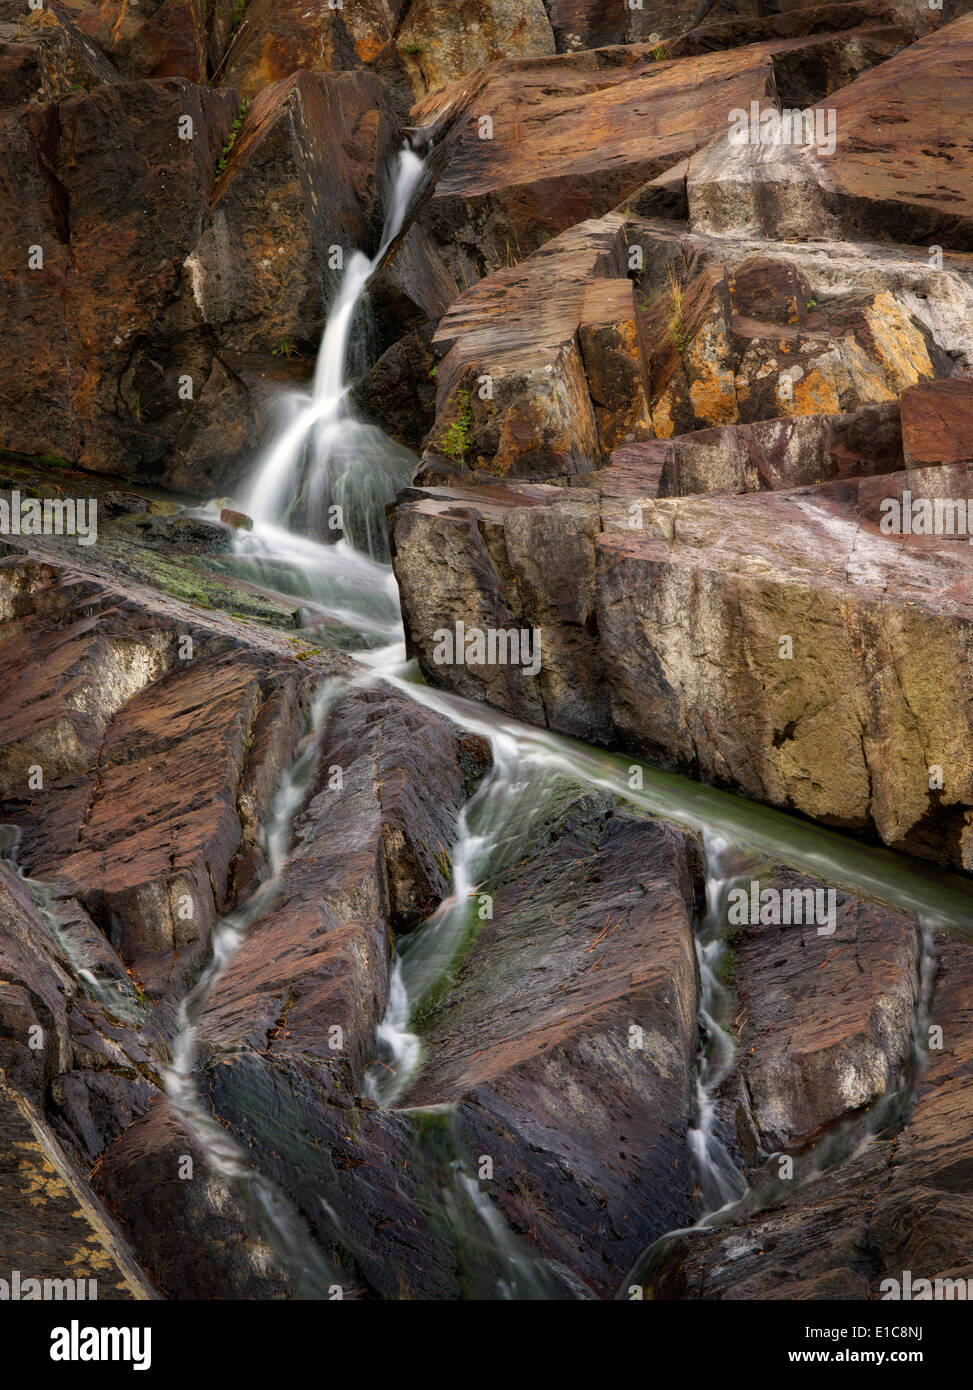 Waterfall on Glen Alpine Creek near Fallen Leaf Lake. California - Stock Image